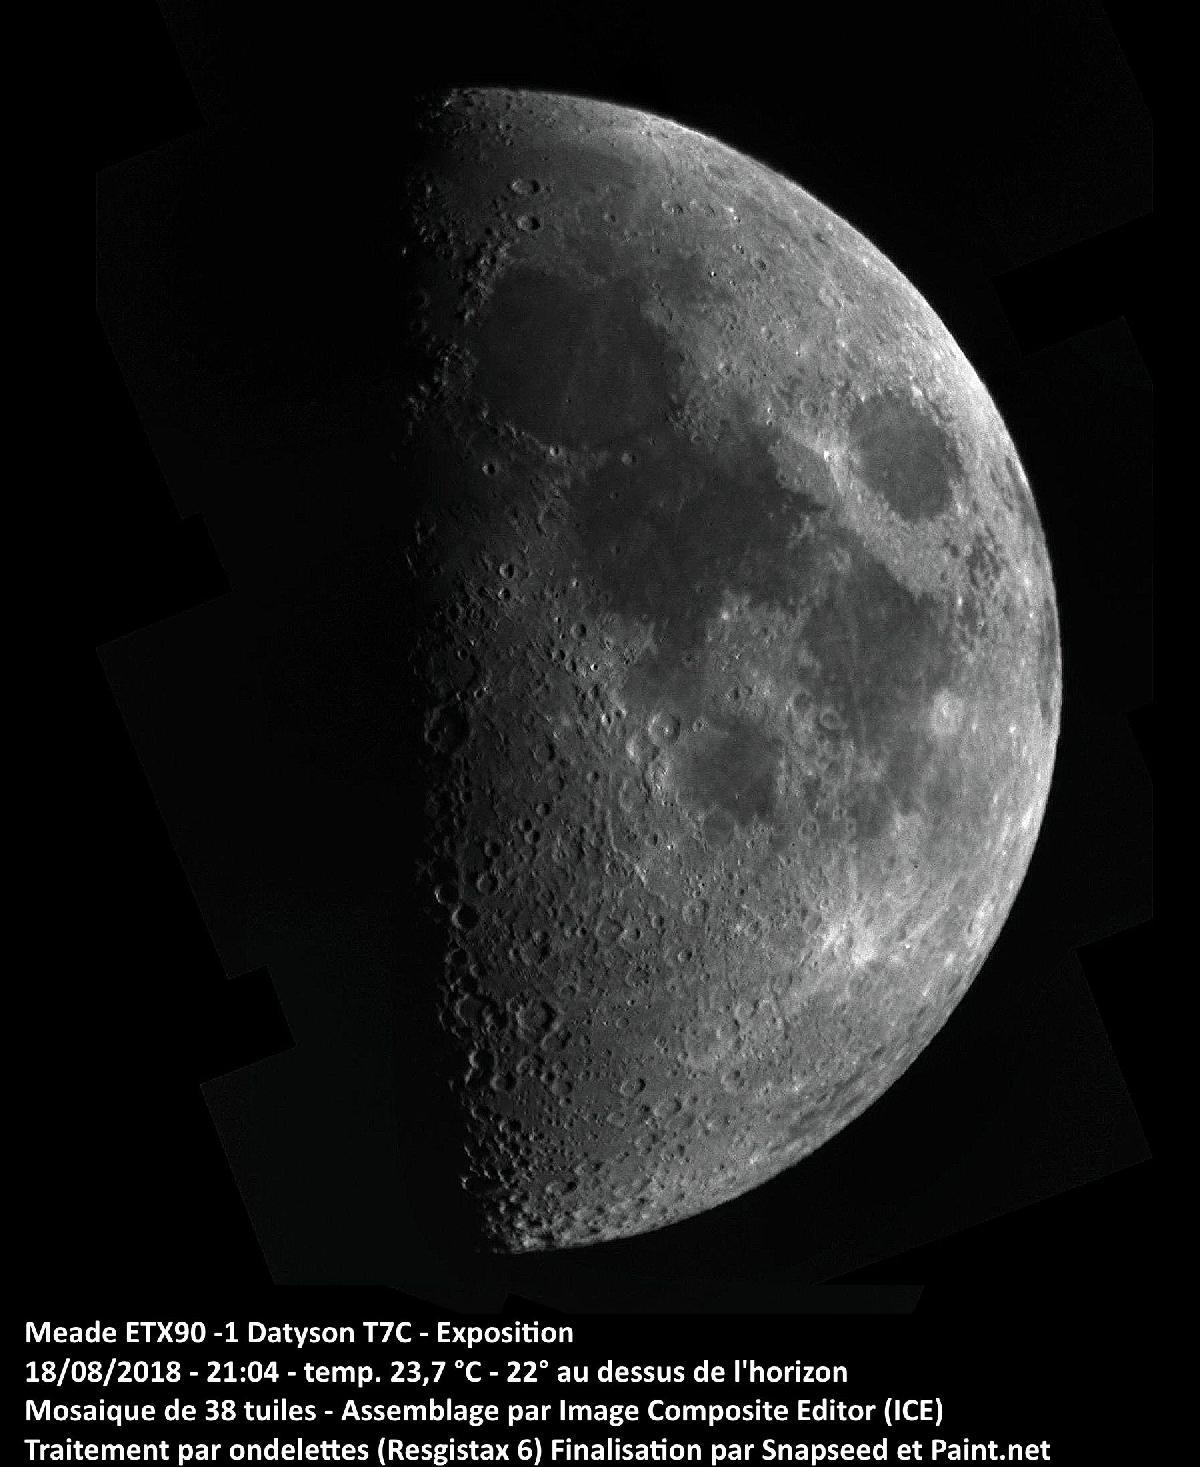 Lune 18 août 2018 - Mosaïque